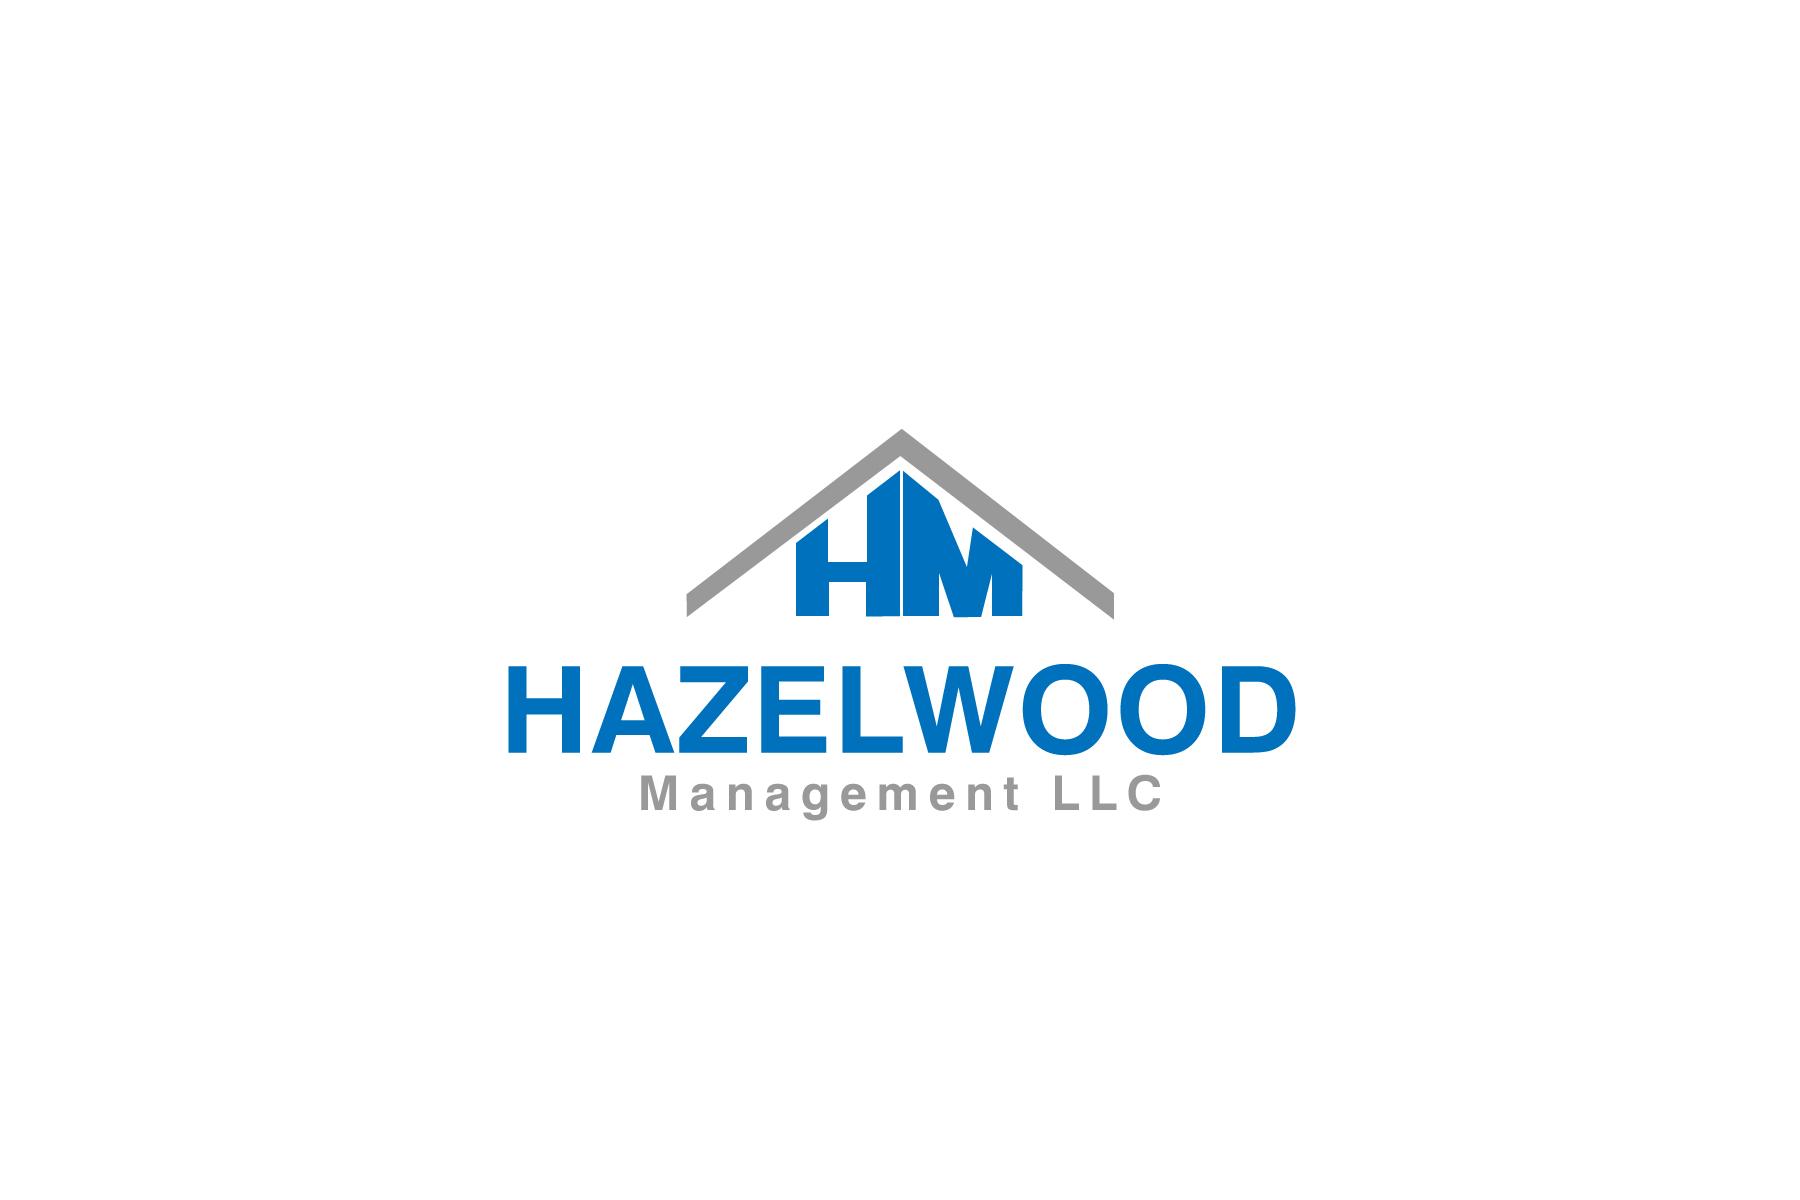 Logo Design by Jagdeep Singh - Entry No. 19 in the Logo Design Contest Hazelwood Management LLC Logo Design.